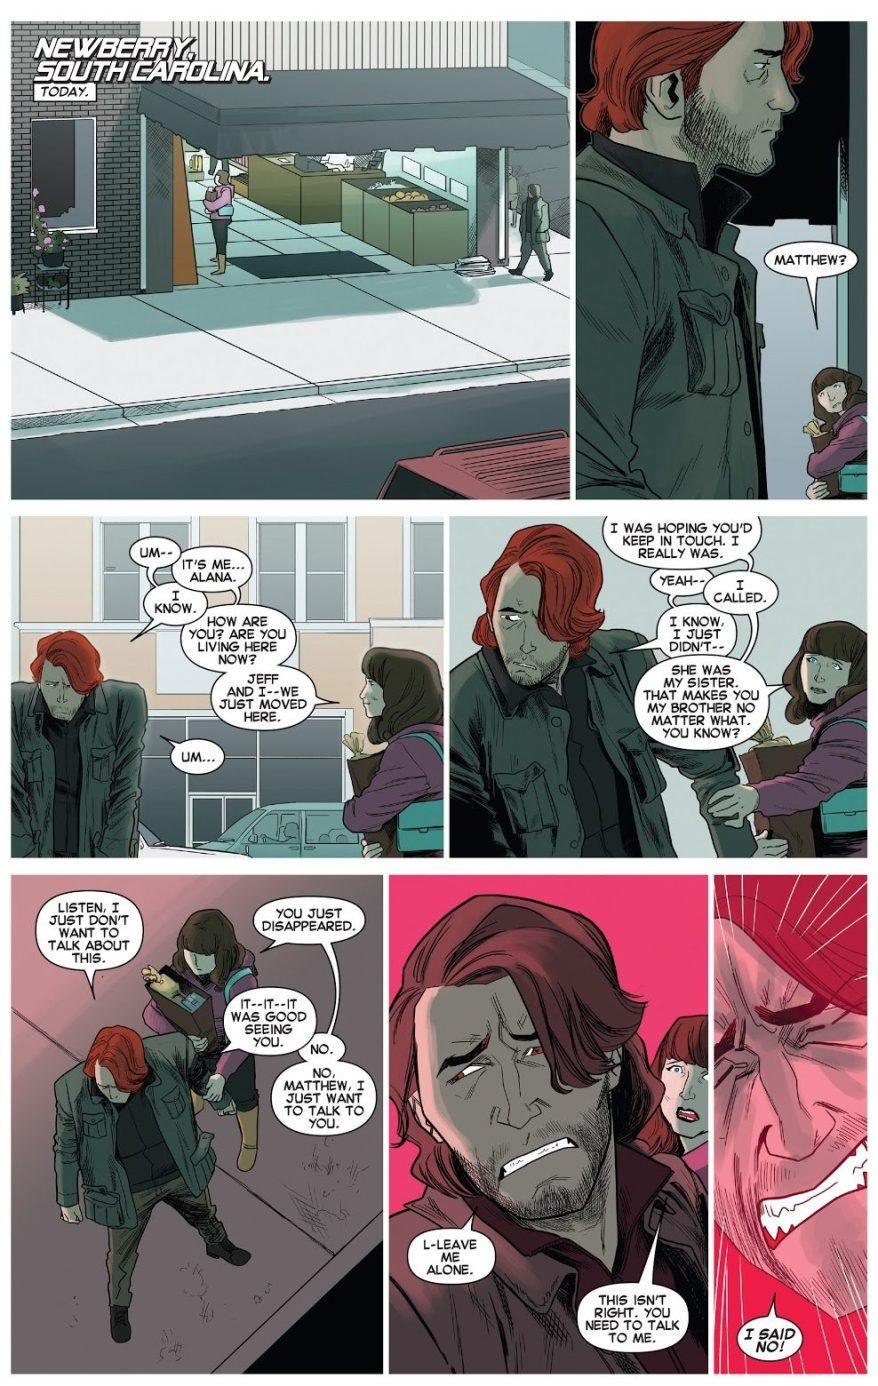 Matthew Malloy's Mutant Powers Activates